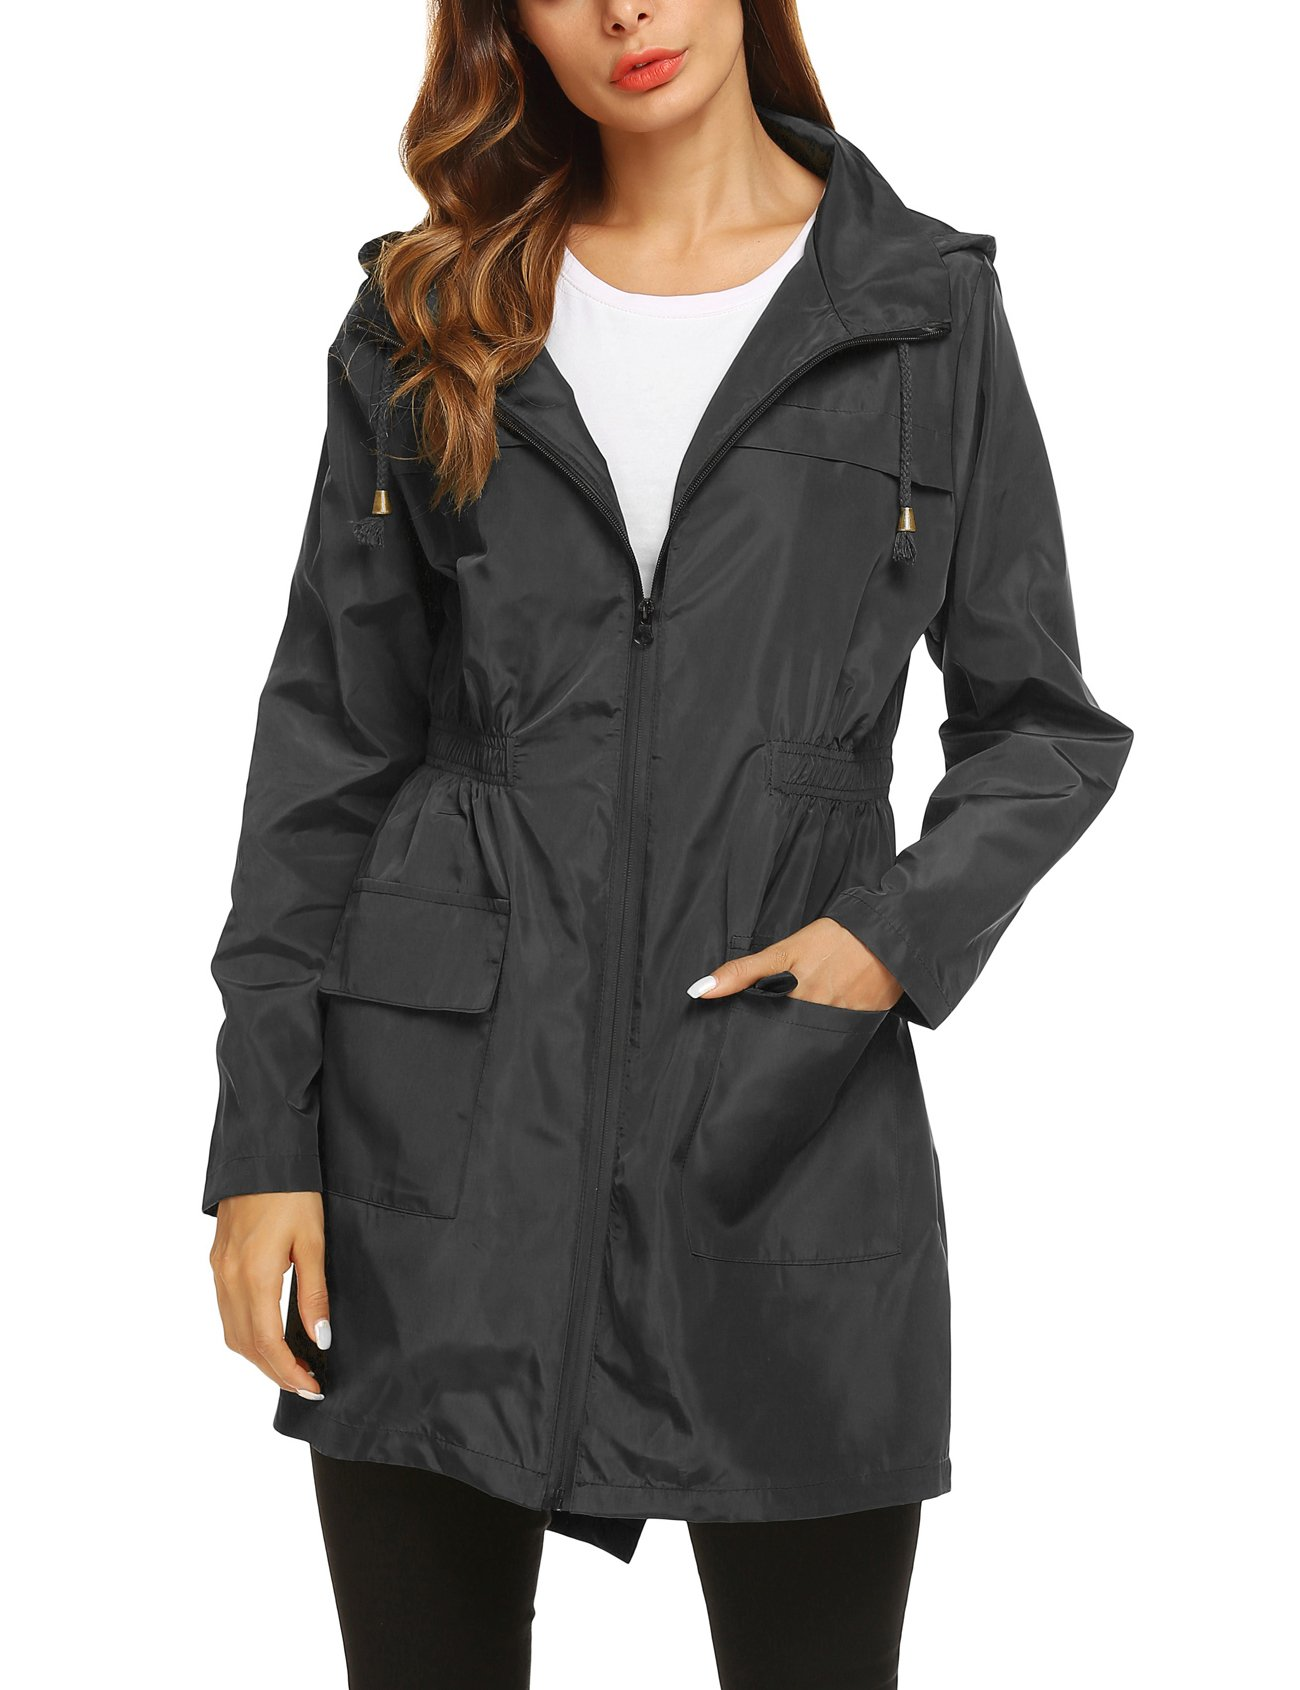 ZHENWEI Womens' Waterproof Lightweight Raincoat Hooded Outdoor Hiking Long Rain Jacket (S, Black1(with Black Zipper))